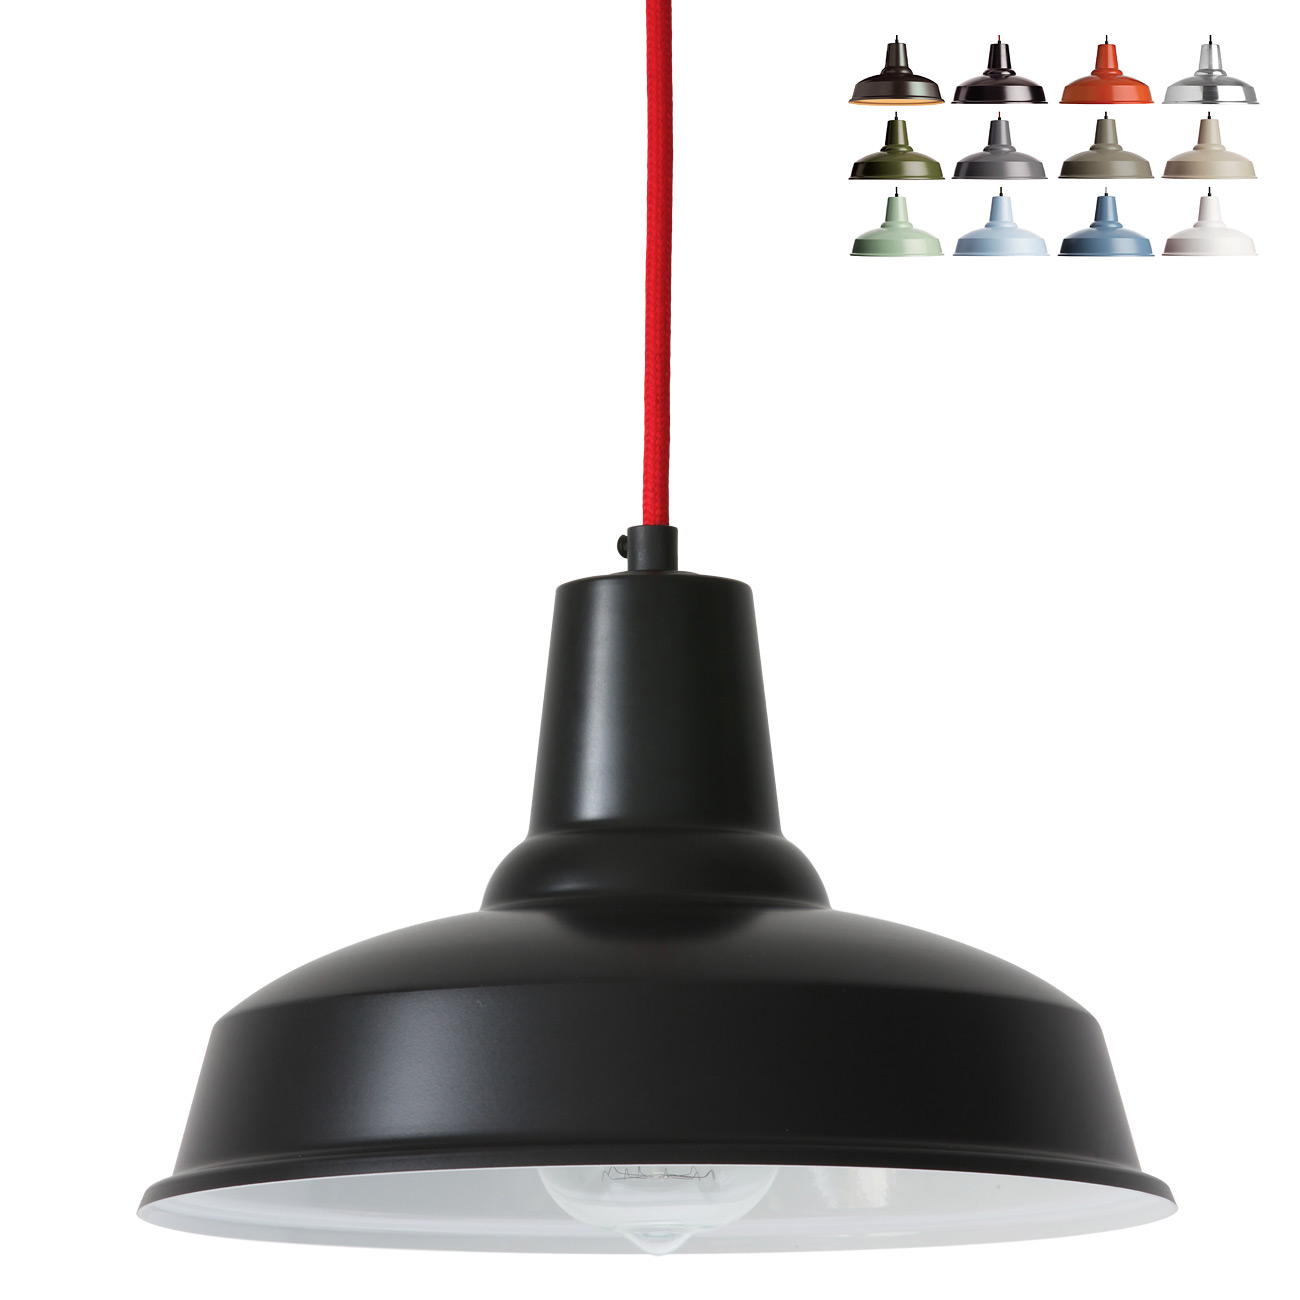 kleine industrial pendelleuchte aus d nemark piccolo 12 farben casa lumi. Black Bedroom Furniture Sets. Home Design Ideas